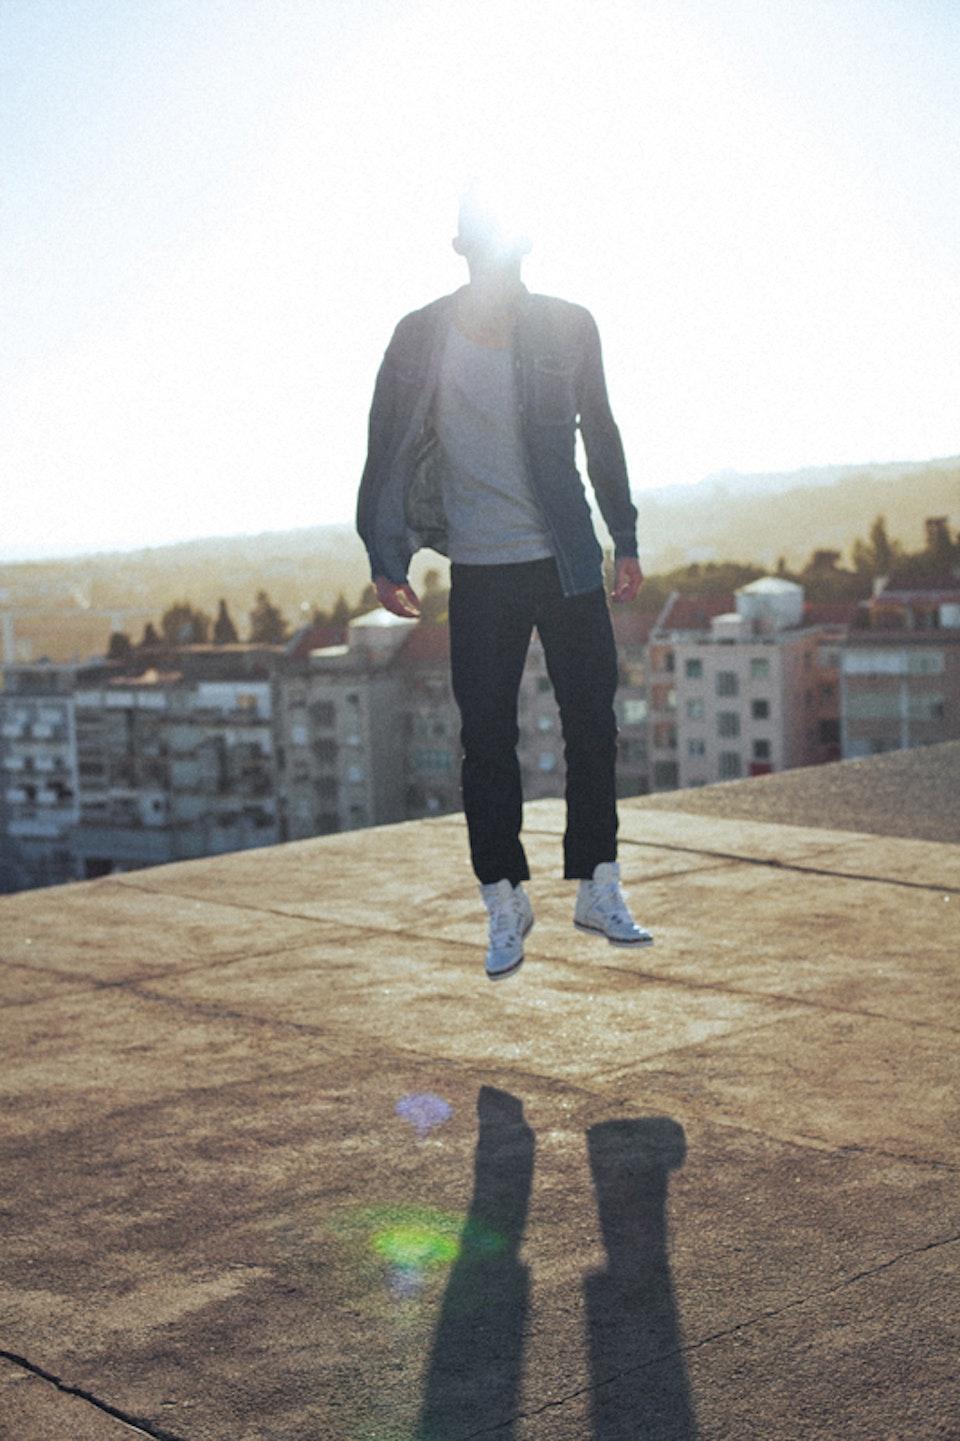 RUI VIEIRA - Film Director, Photographer & Creative Director - Adidas - Originals Blue Collection for Park Mag